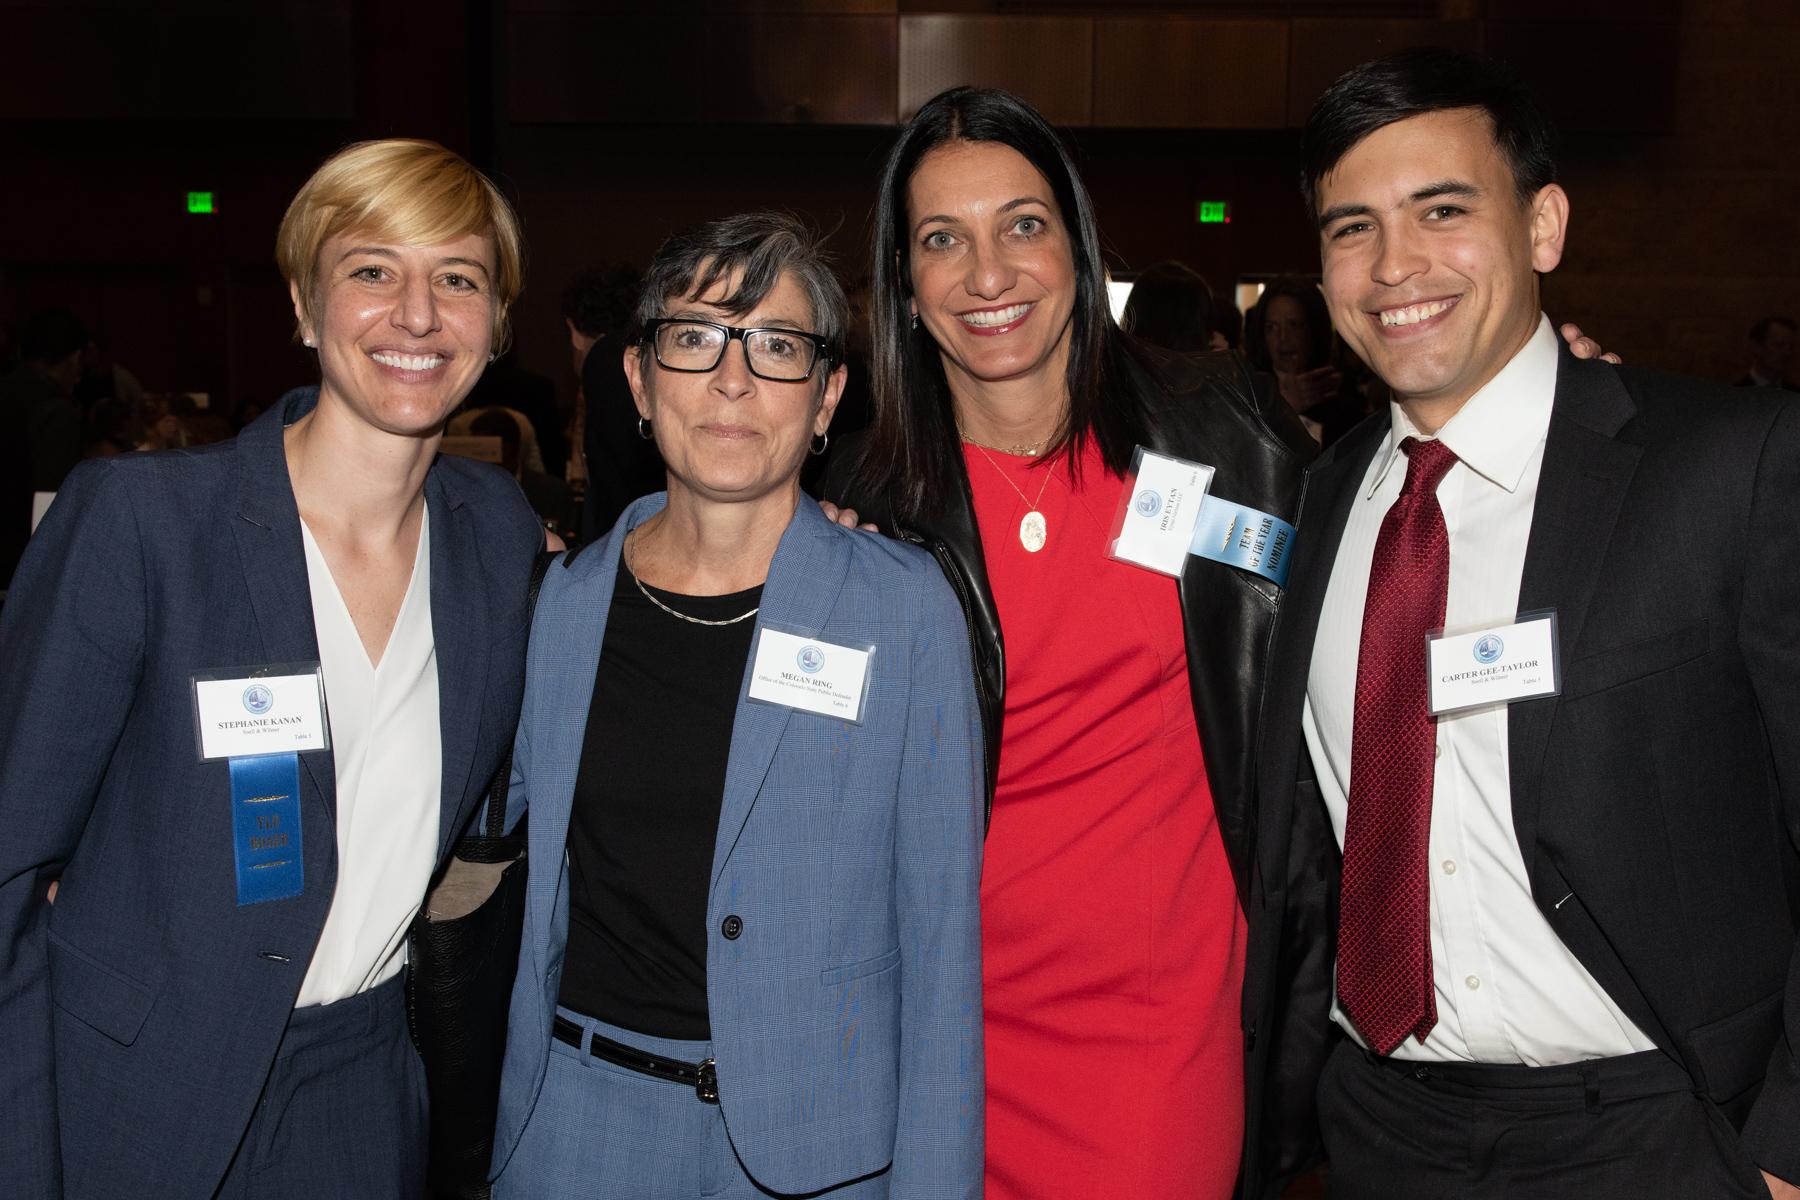 _DSC7221 Stephanie Kanan, Megan Ring, Iris Eytan & Carter Gee-Taylor (courtesy of Hartmannphoto).jpg